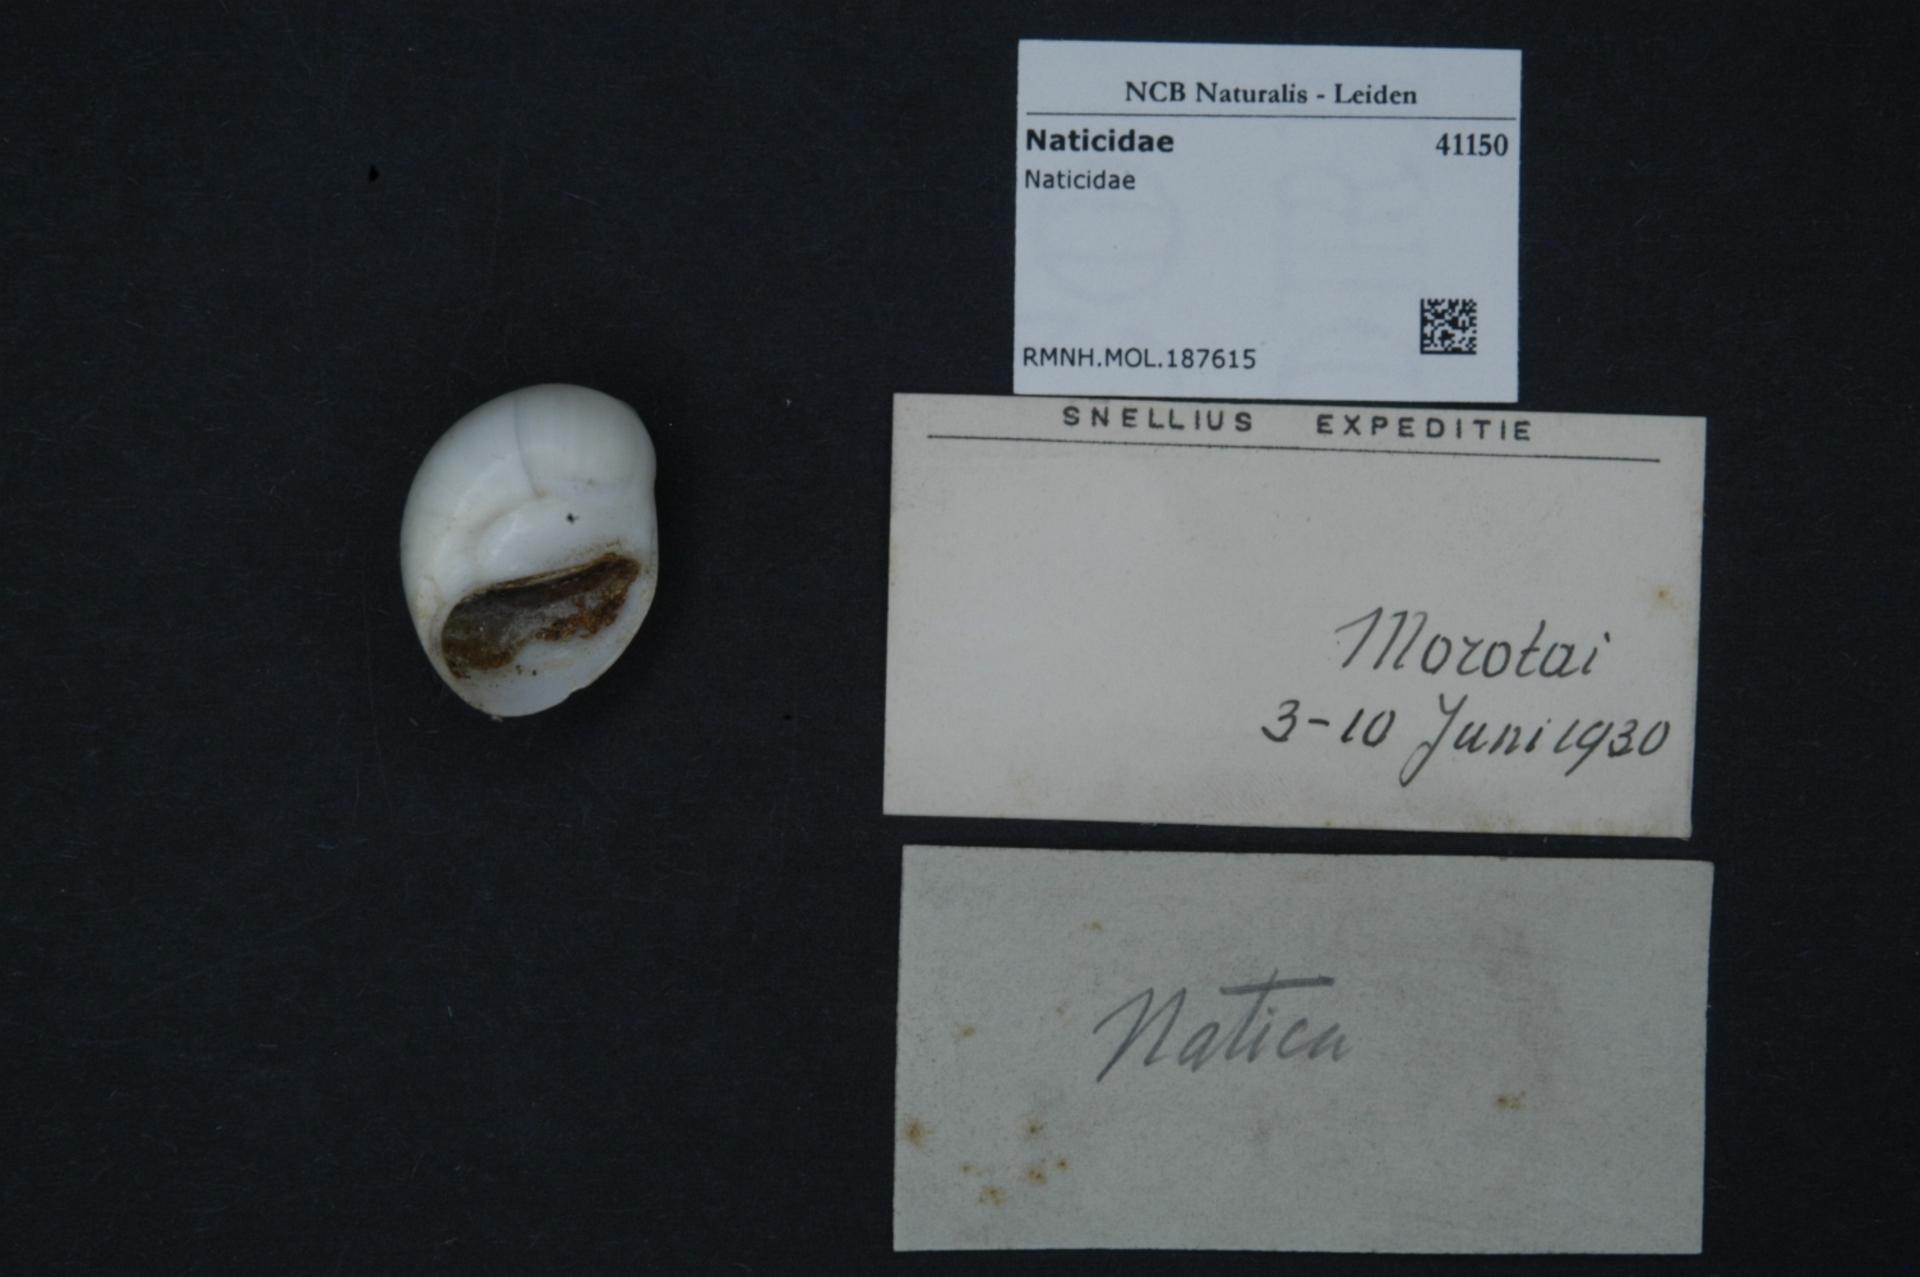 RMNH.MOL.187615 | Polinices mammilla (Linnaeus, 1758)